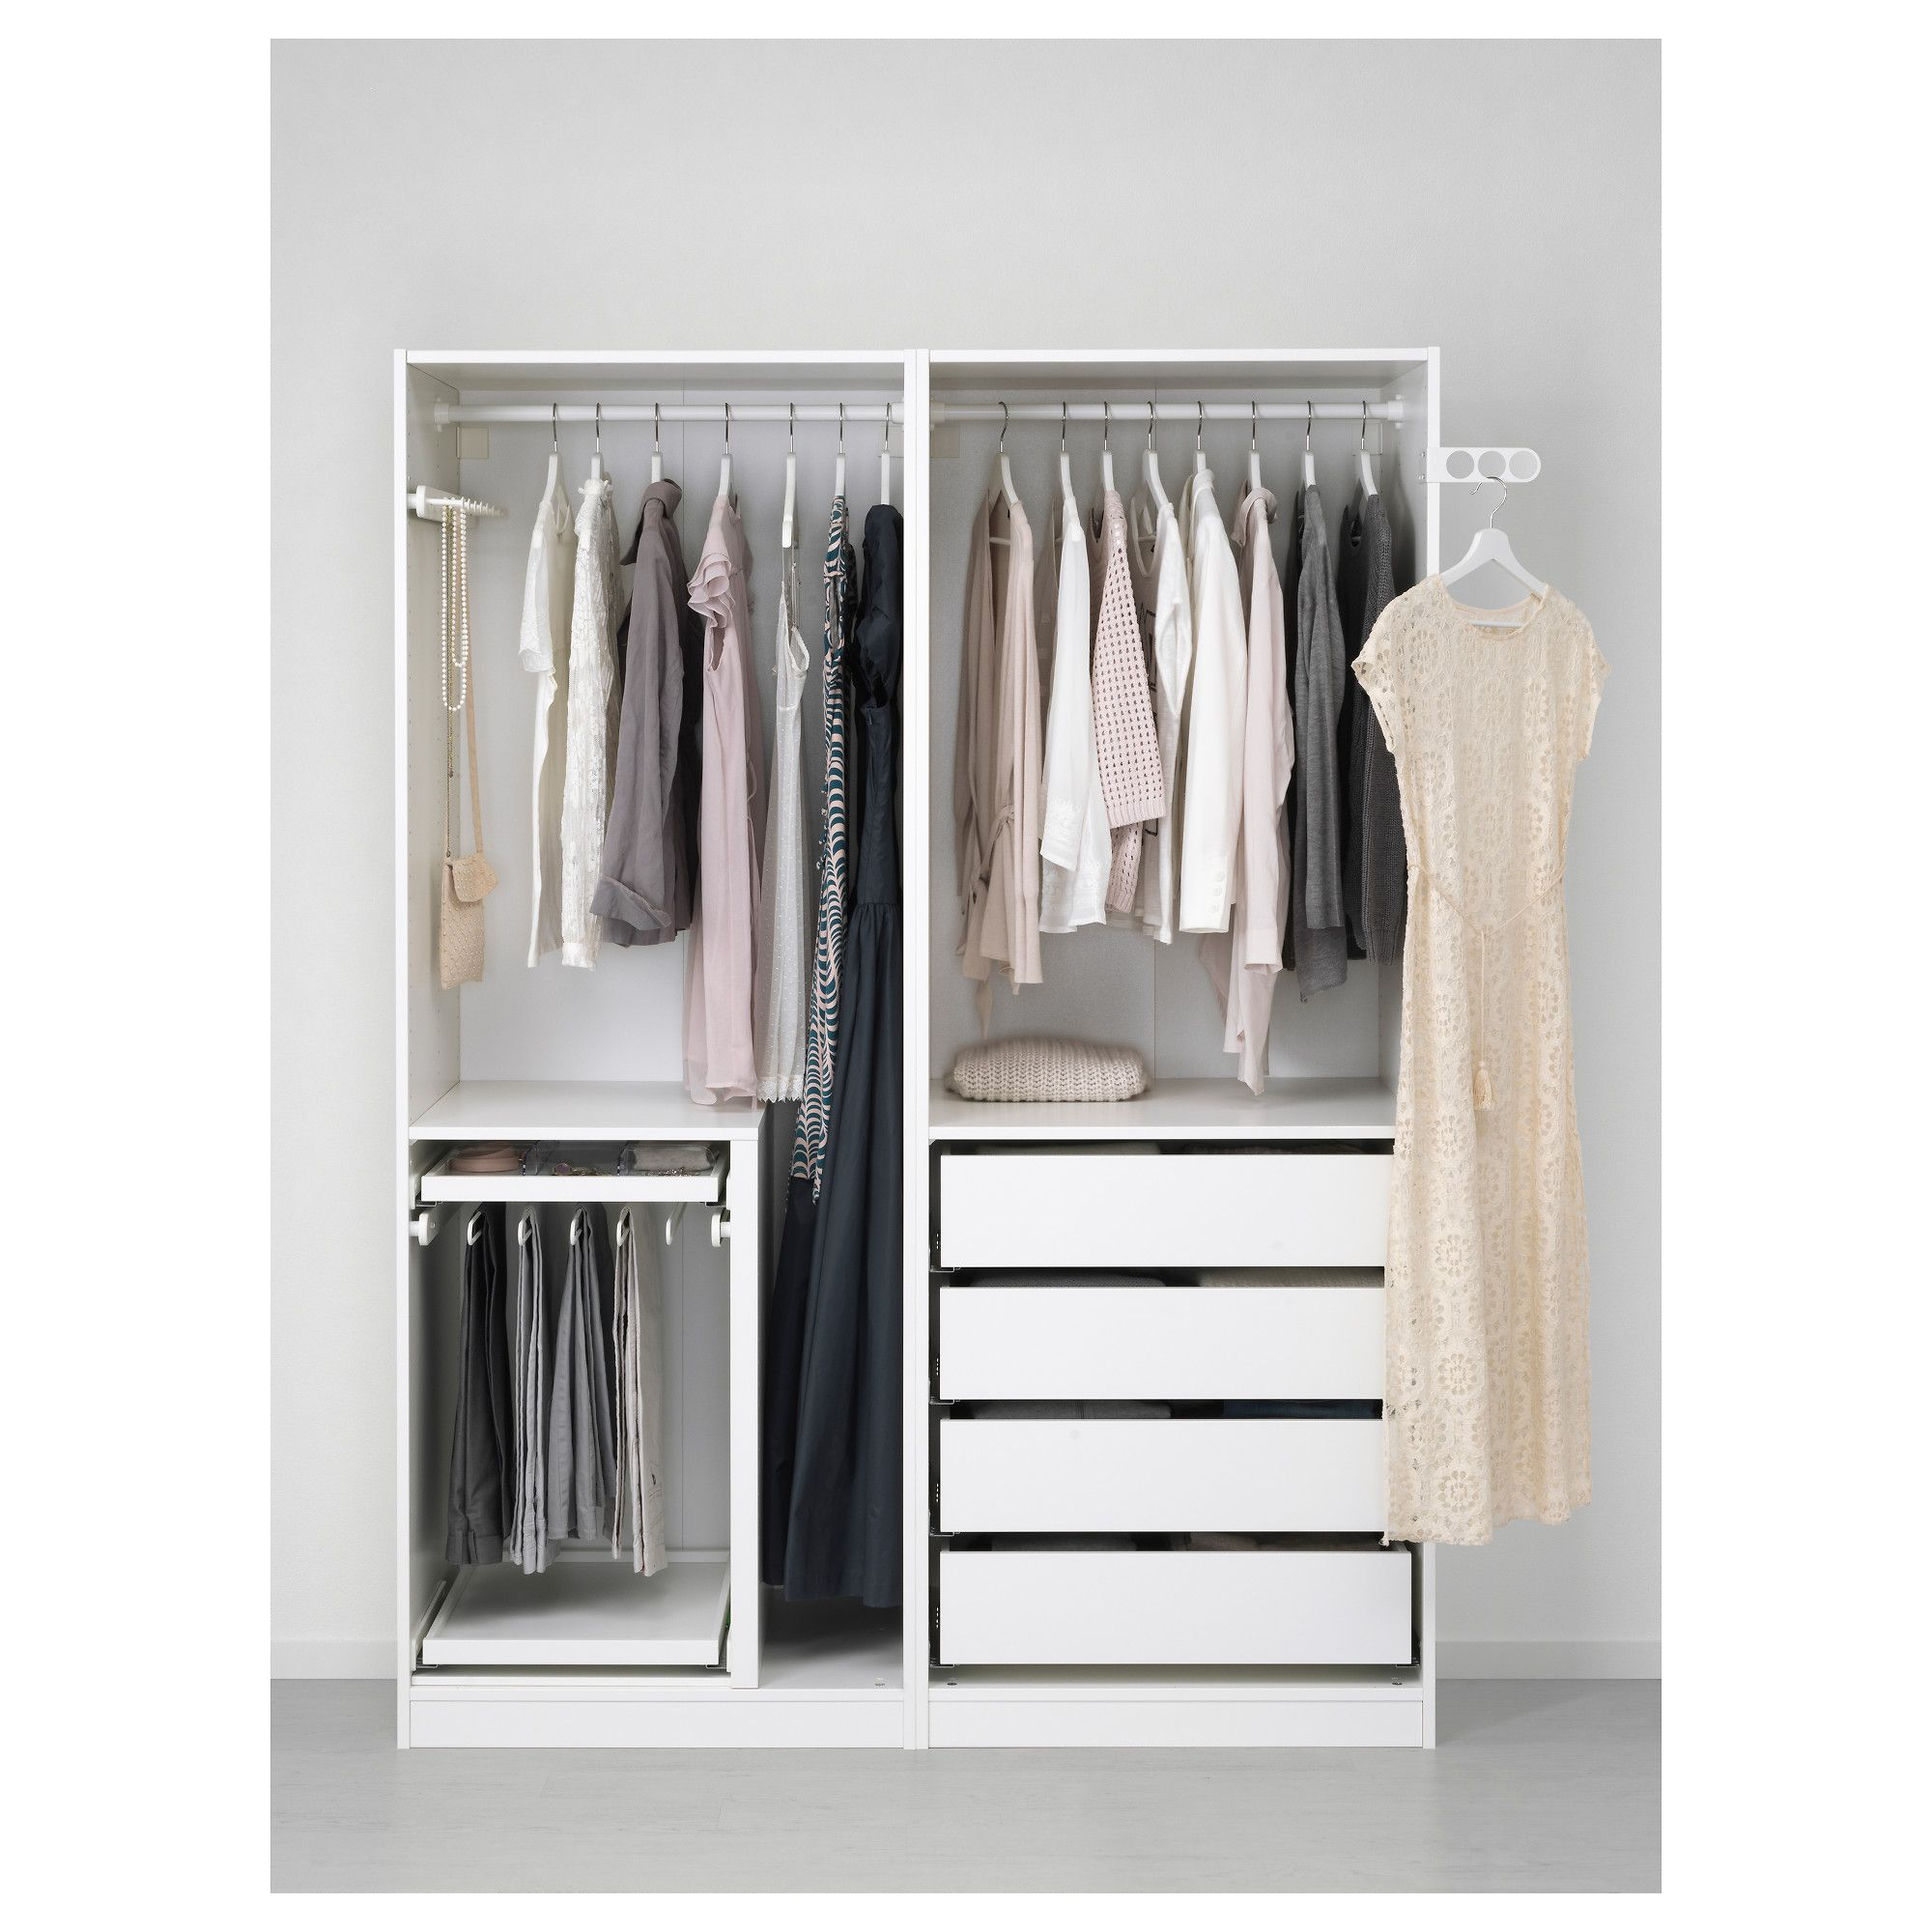 Furniture And Home Furnishings Malenkij Shkaf Shkaf Paks Shkaf